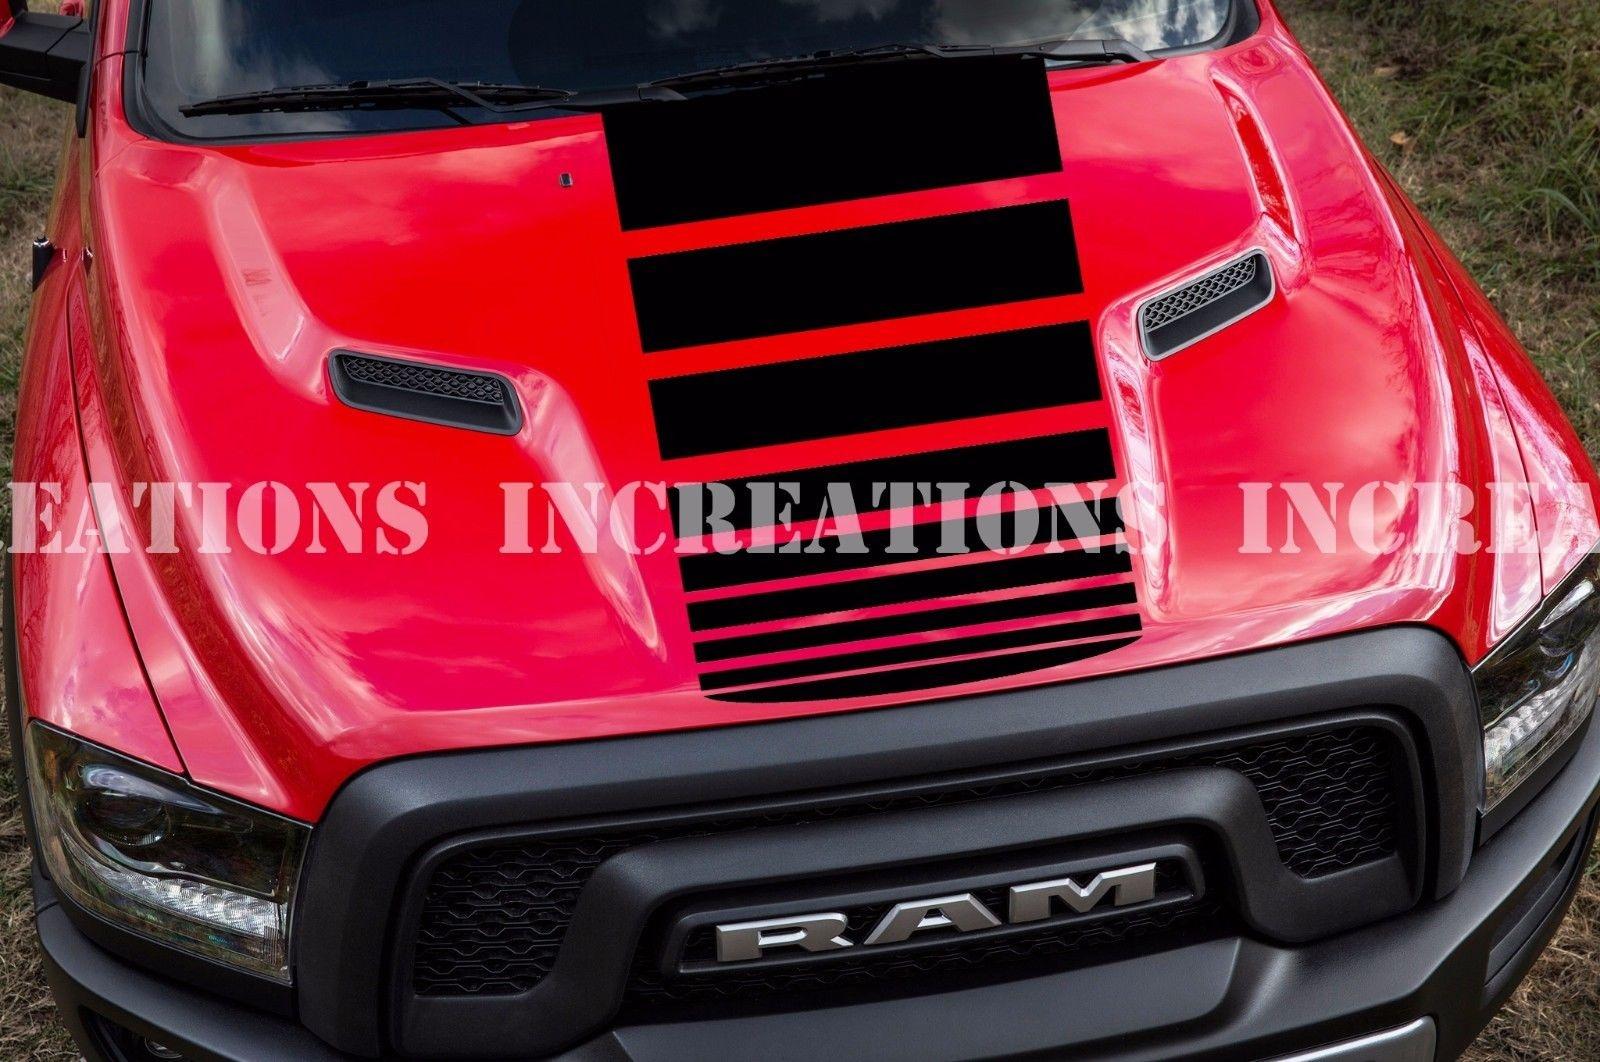 For Universal Hemi Dodge Ram Hood Decal Sticker Racing Any Truck Fading Stripe Gmc Car Stickers Aliexpress